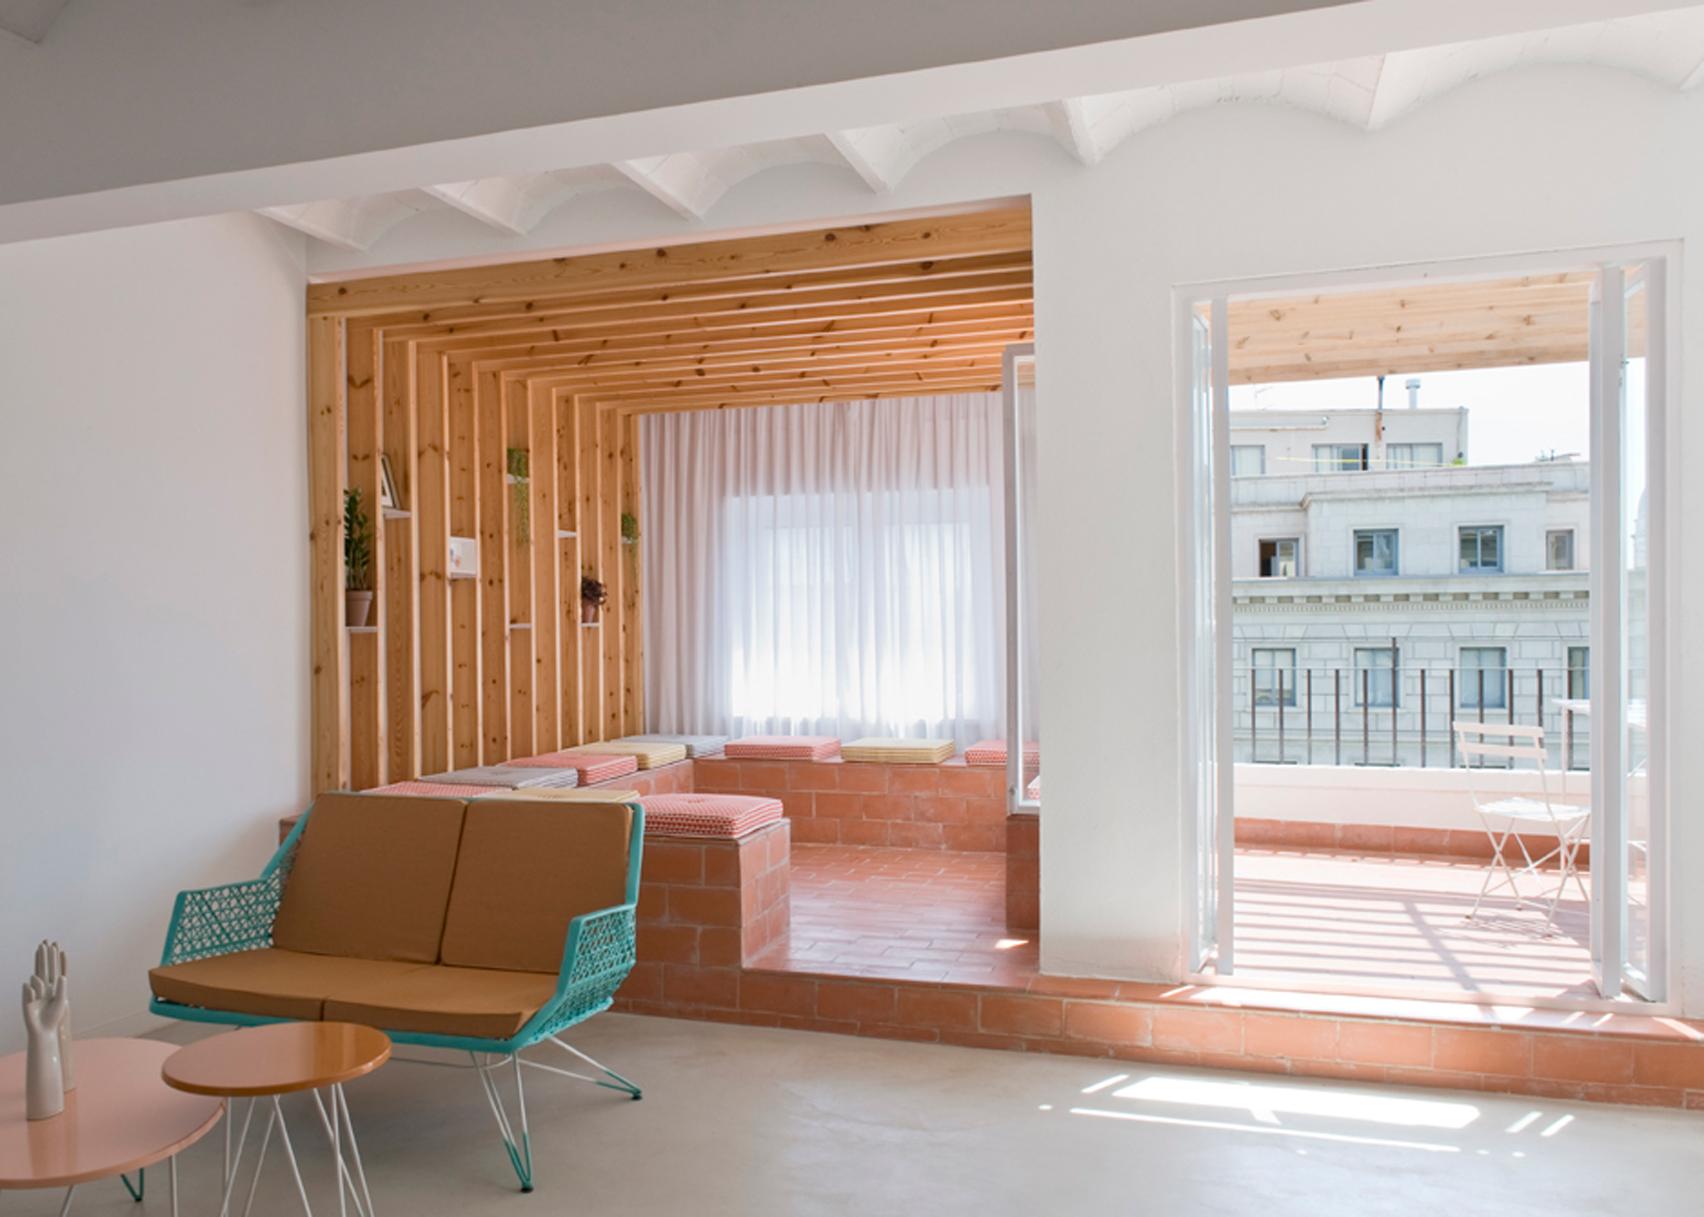 Rocha apartment by CaSA